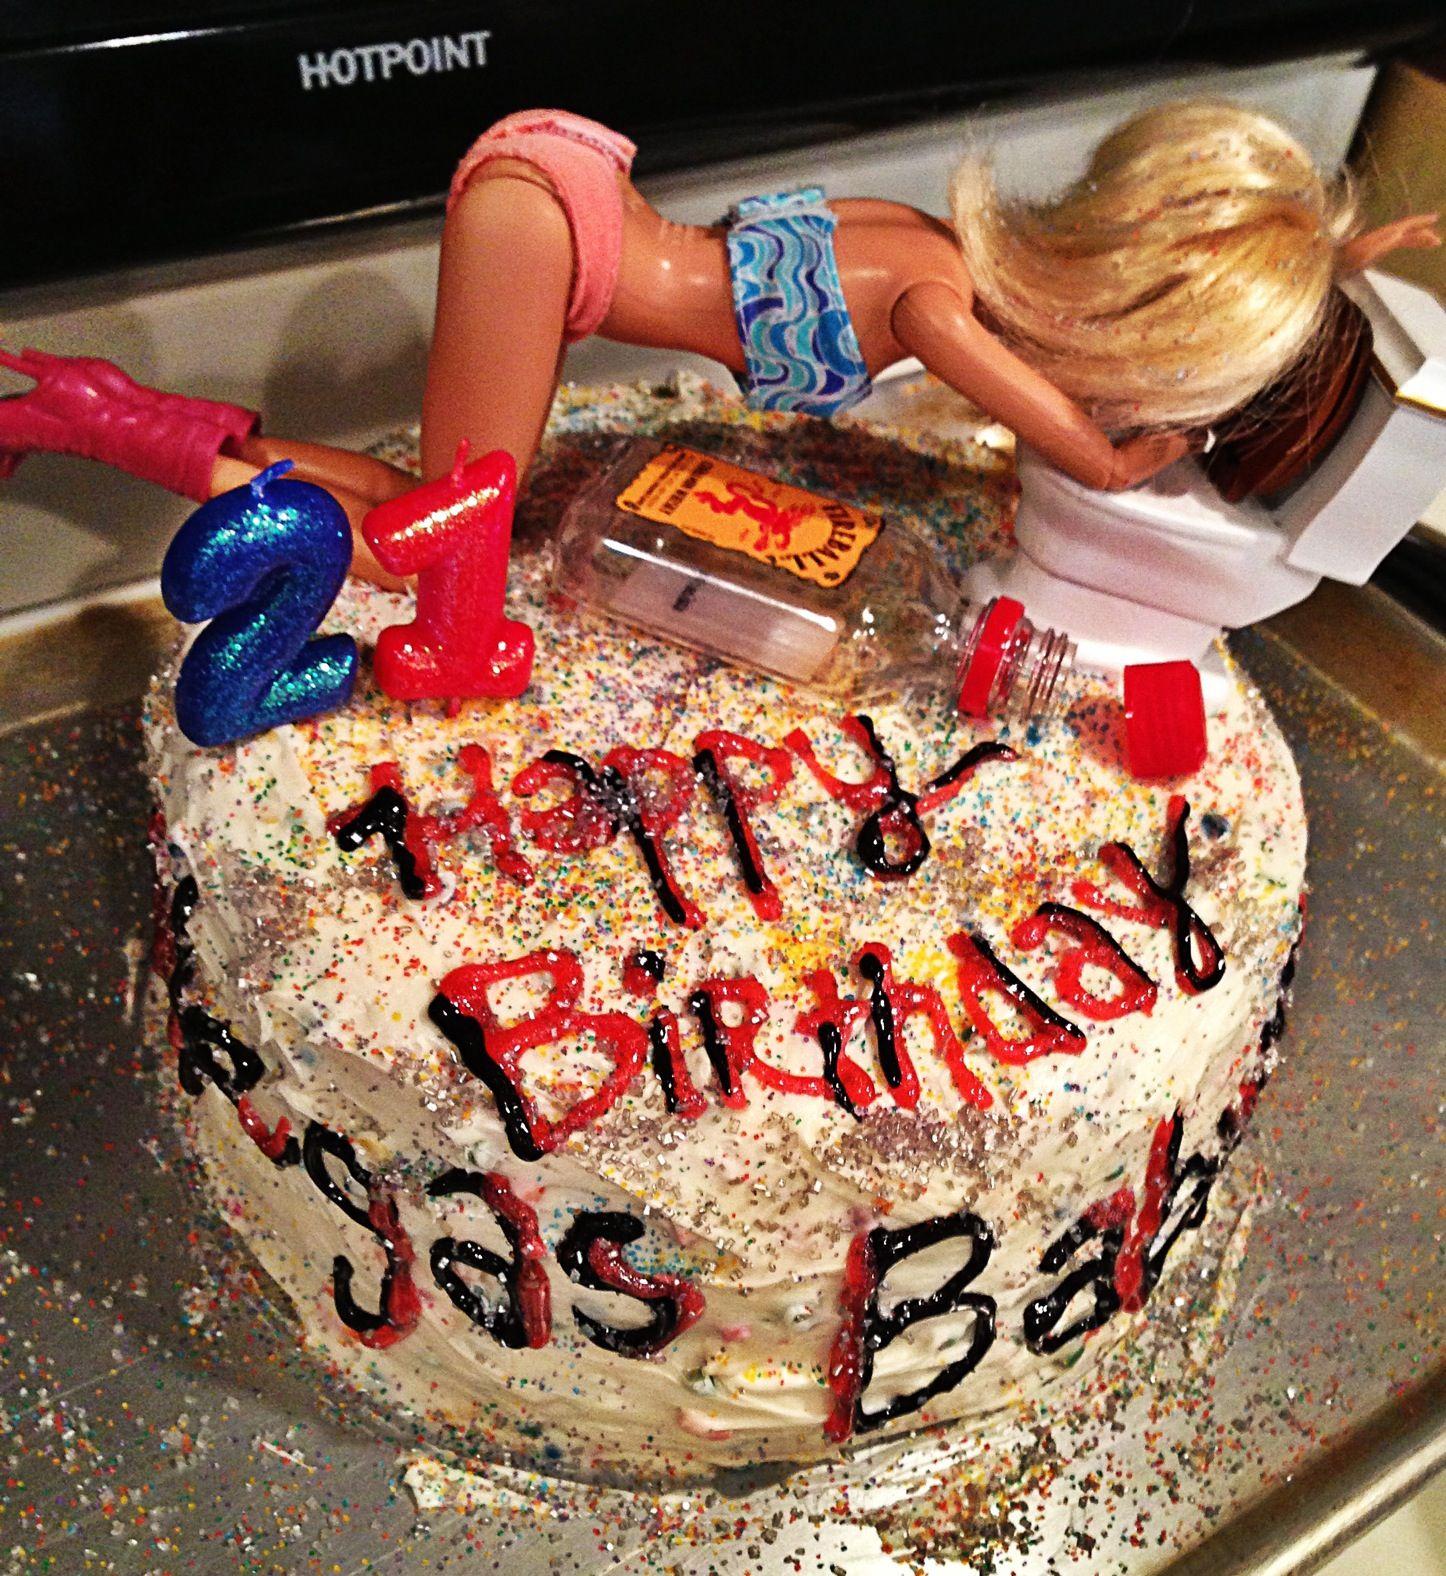 My Little Sisters 21st Birthday Cake! @VictoriaSacksteder